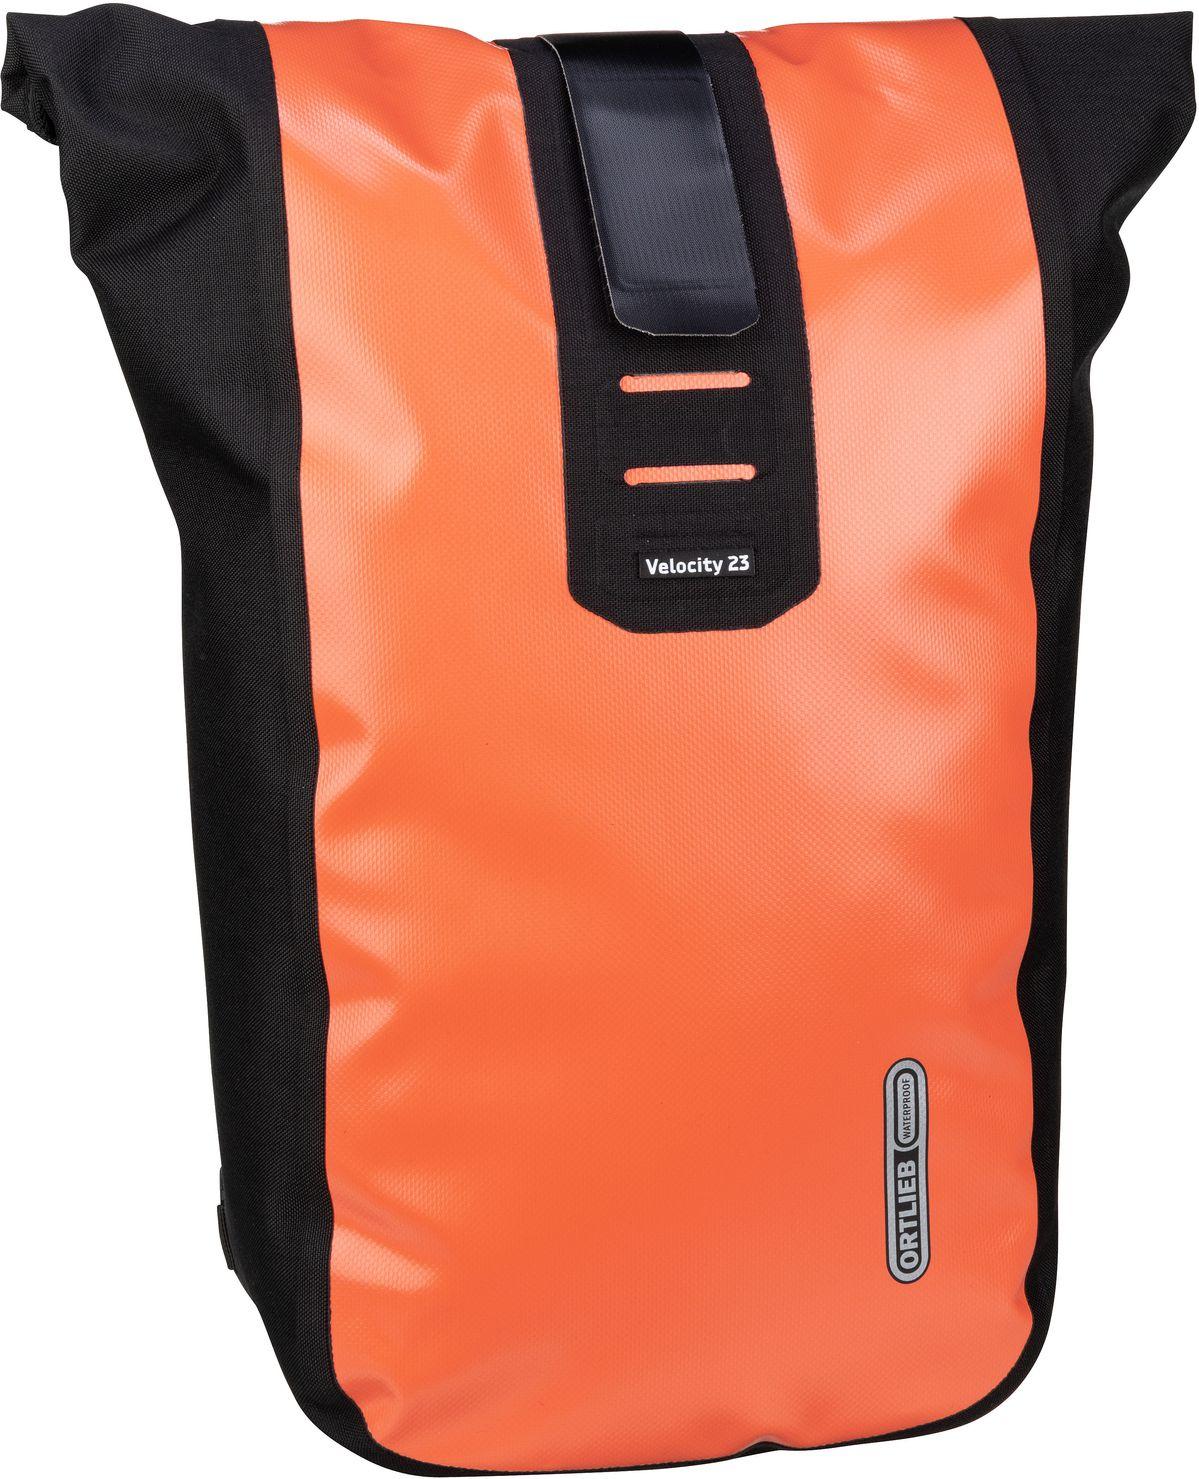 Rucksack / Daypack Velocity 23L Coral-Black (23 Liter)